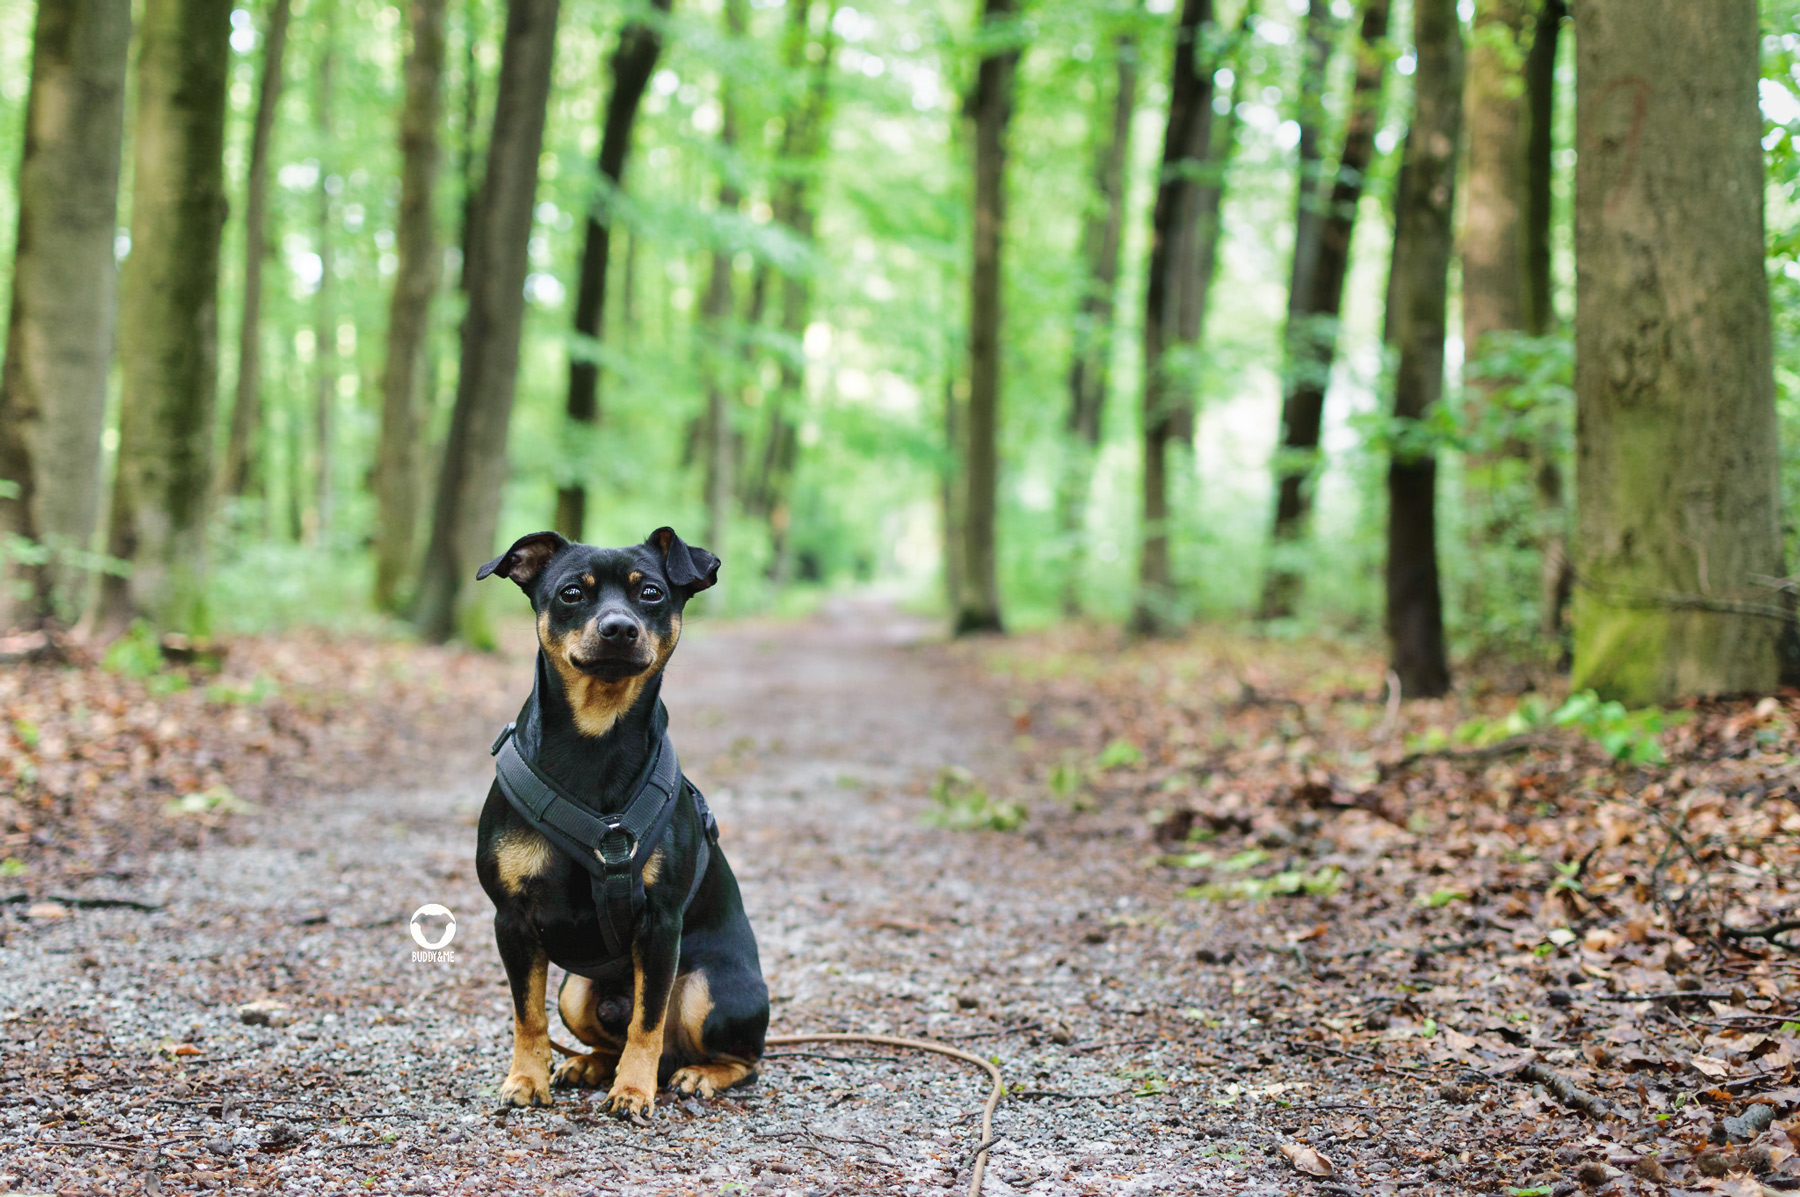 Pinscher Buddy, Buddy and Me, Hundeblog, Dogblog, Essen, Ruhrgebiet, Spazieren, Wandern, Gassi, Tipps, Wald, Frühling, Mülheim, Broich-Speldorf, Waldlernpfad